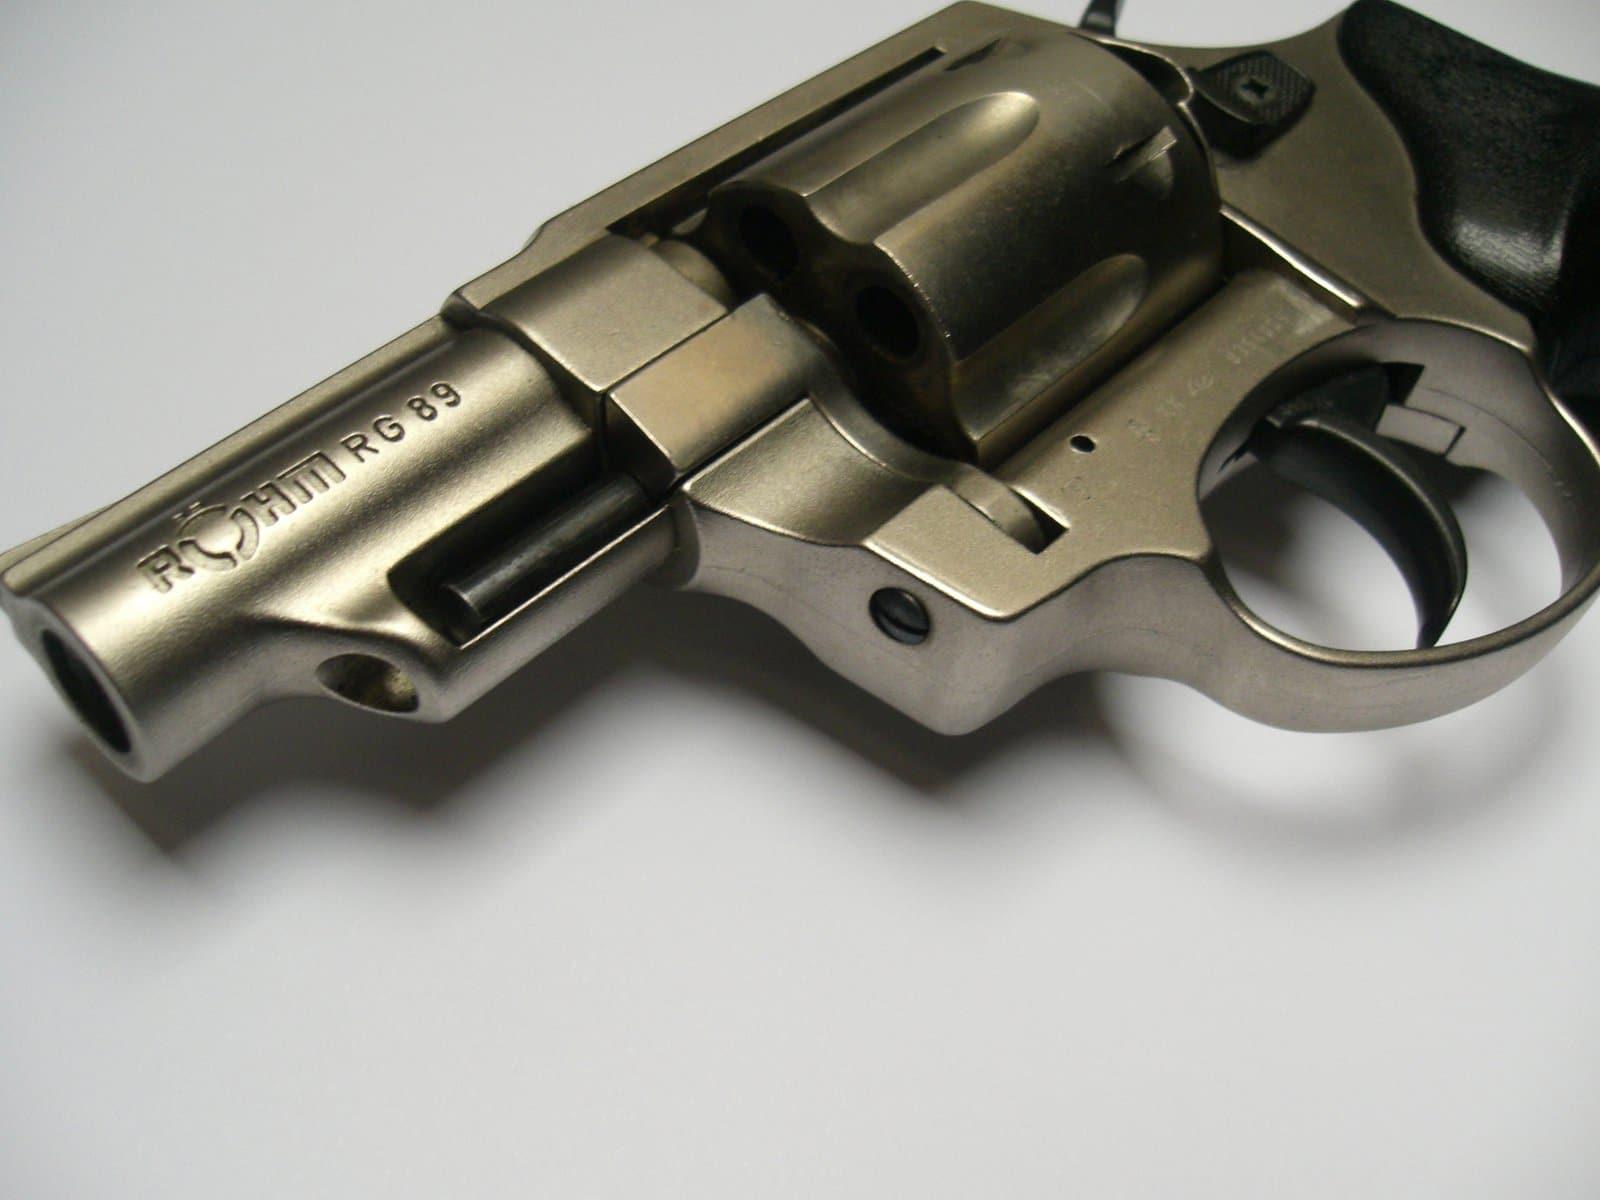 pistol-1425591